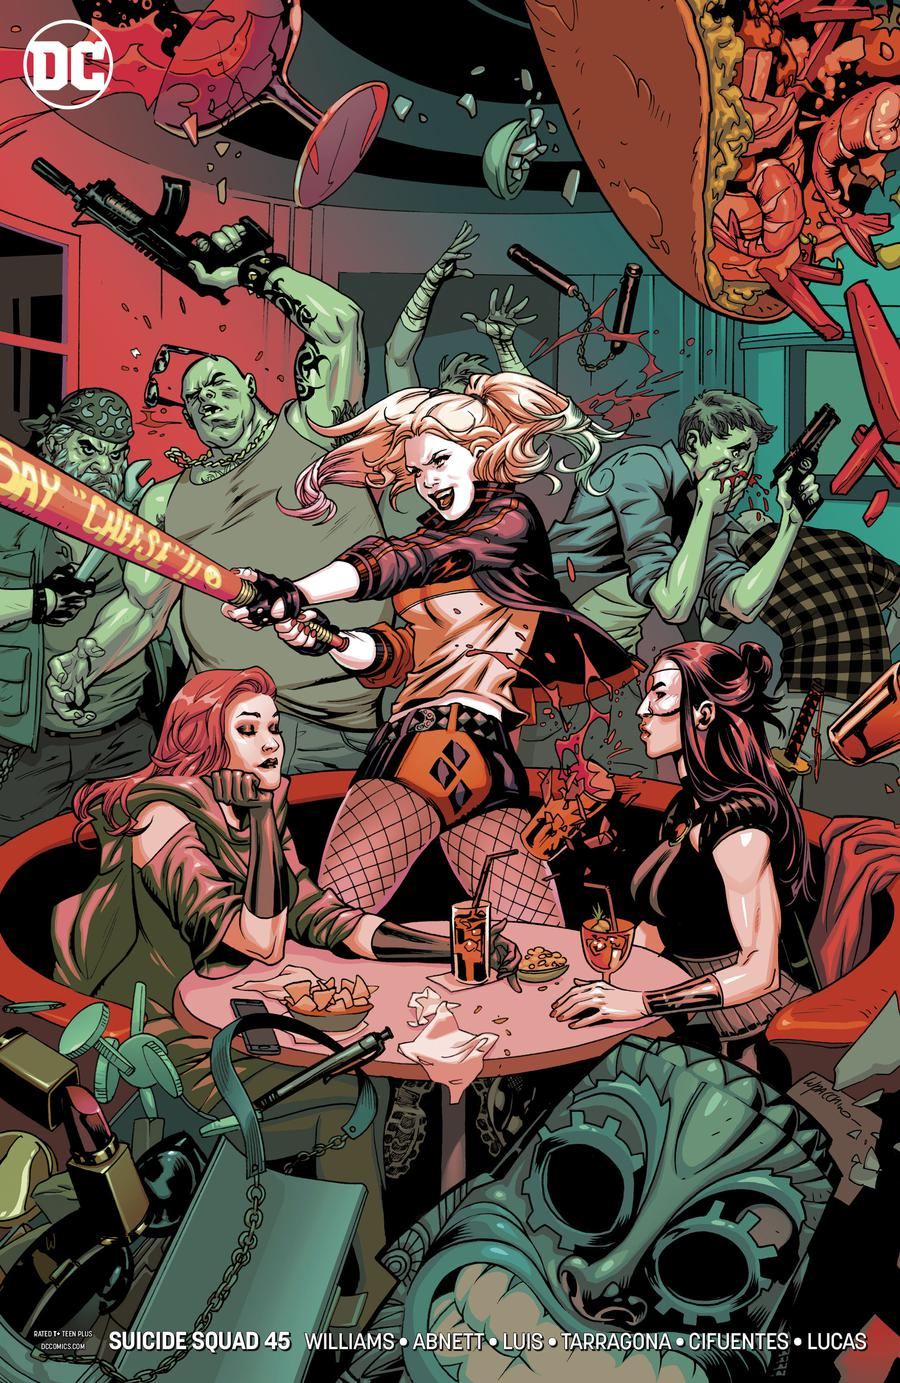 Suicide Squad Vol 4 #45 Cover B Variant Emanuela Lupacchino Cover (Sink Atlantis Part 1)